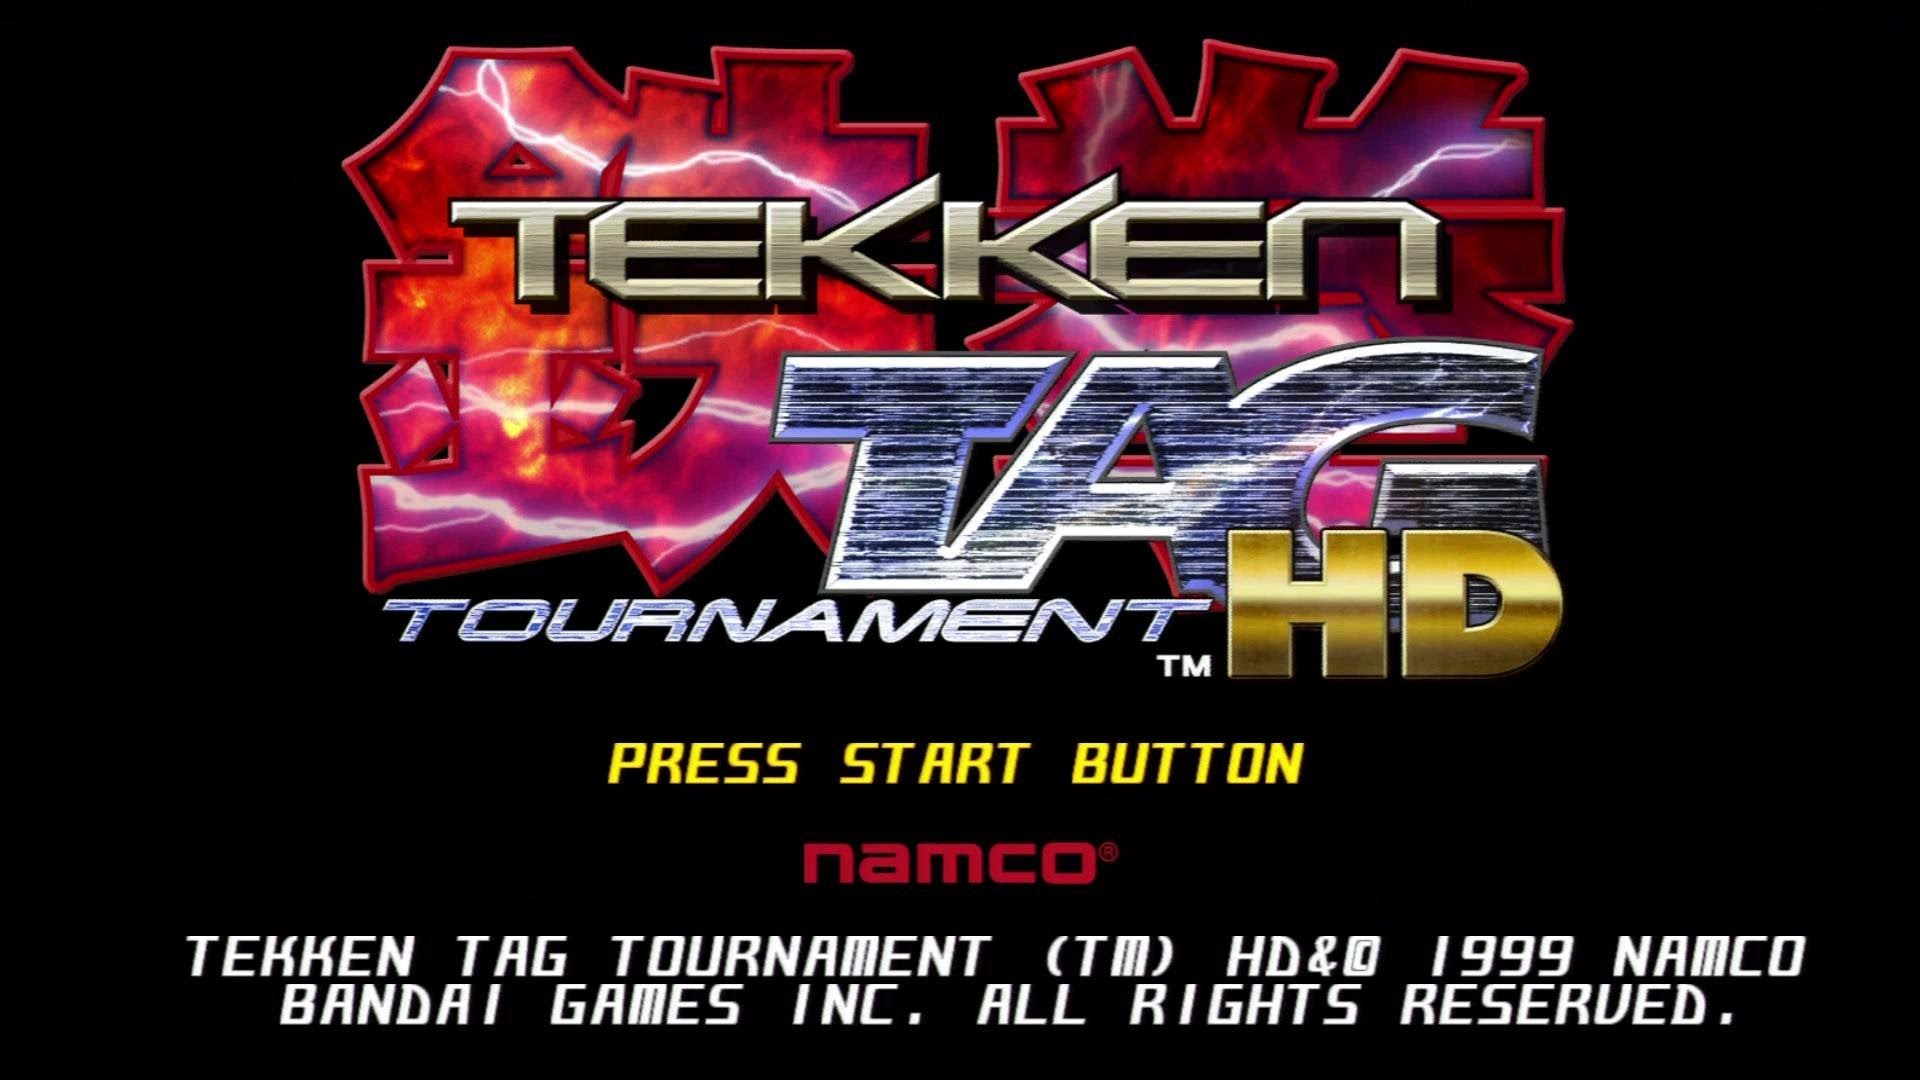 Tekken tag tournament 2 Logos